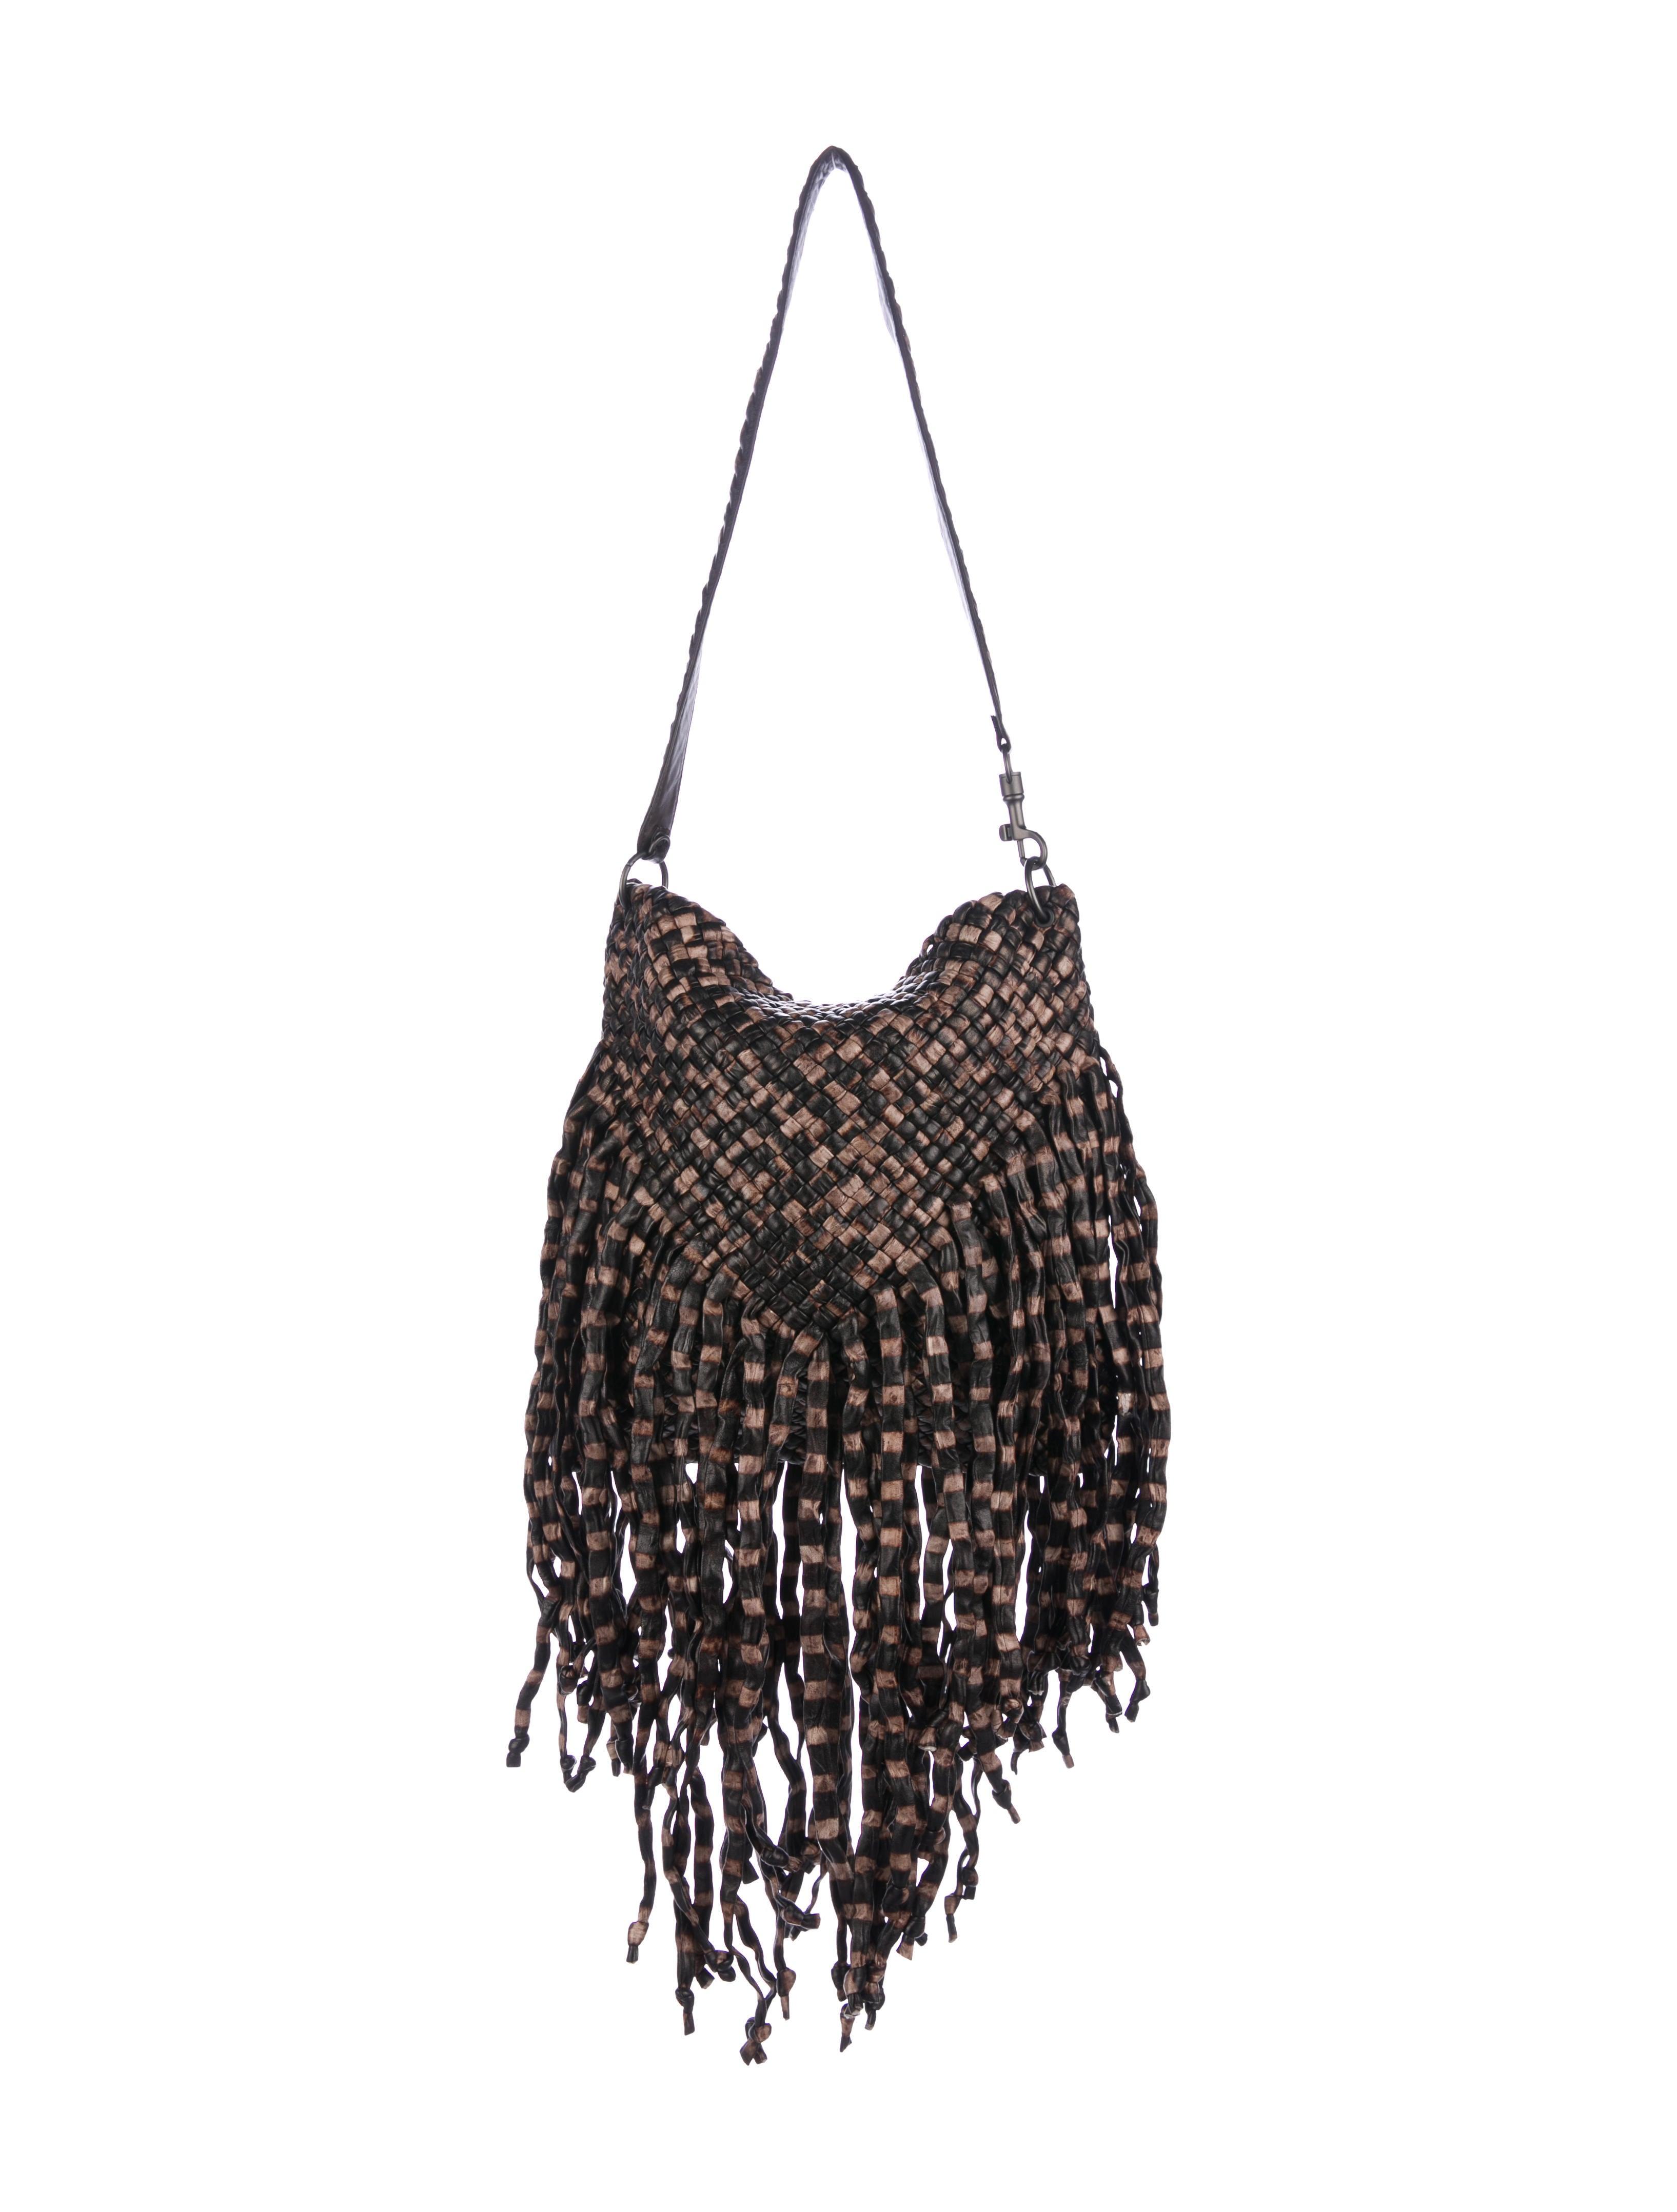 1d5525932c2 Bottega Veneta Tie-Dye Nappa Umbria Bag - Handbags - BOT56645   The ...